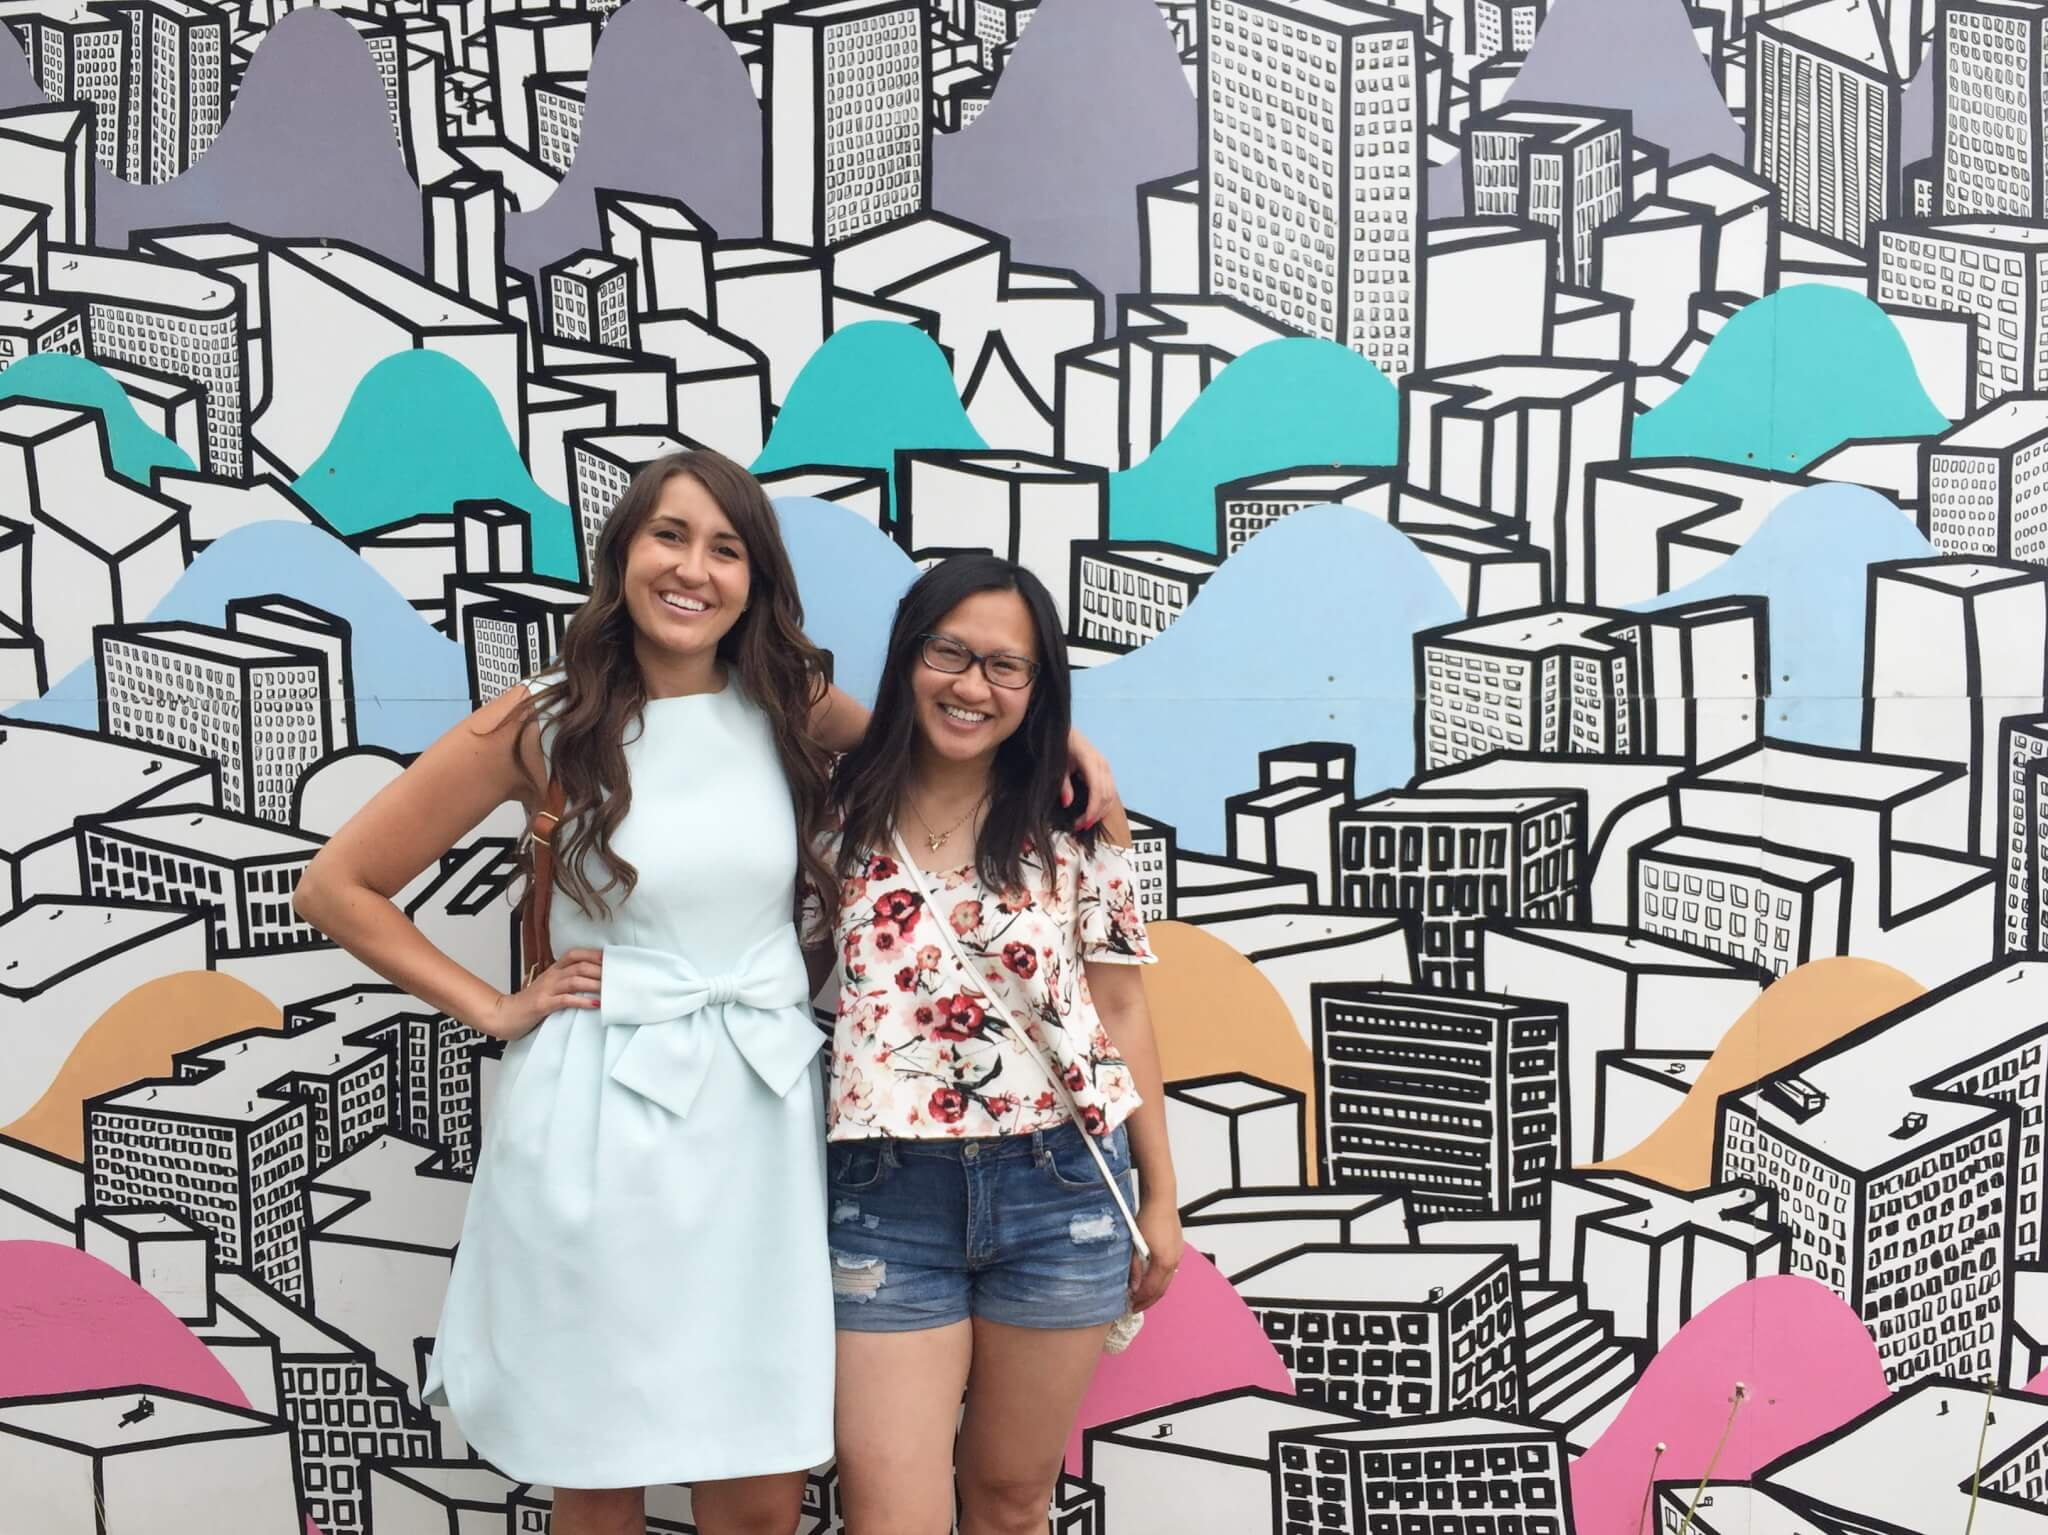 Guide to Top Instagrammable Walls of Edmonton